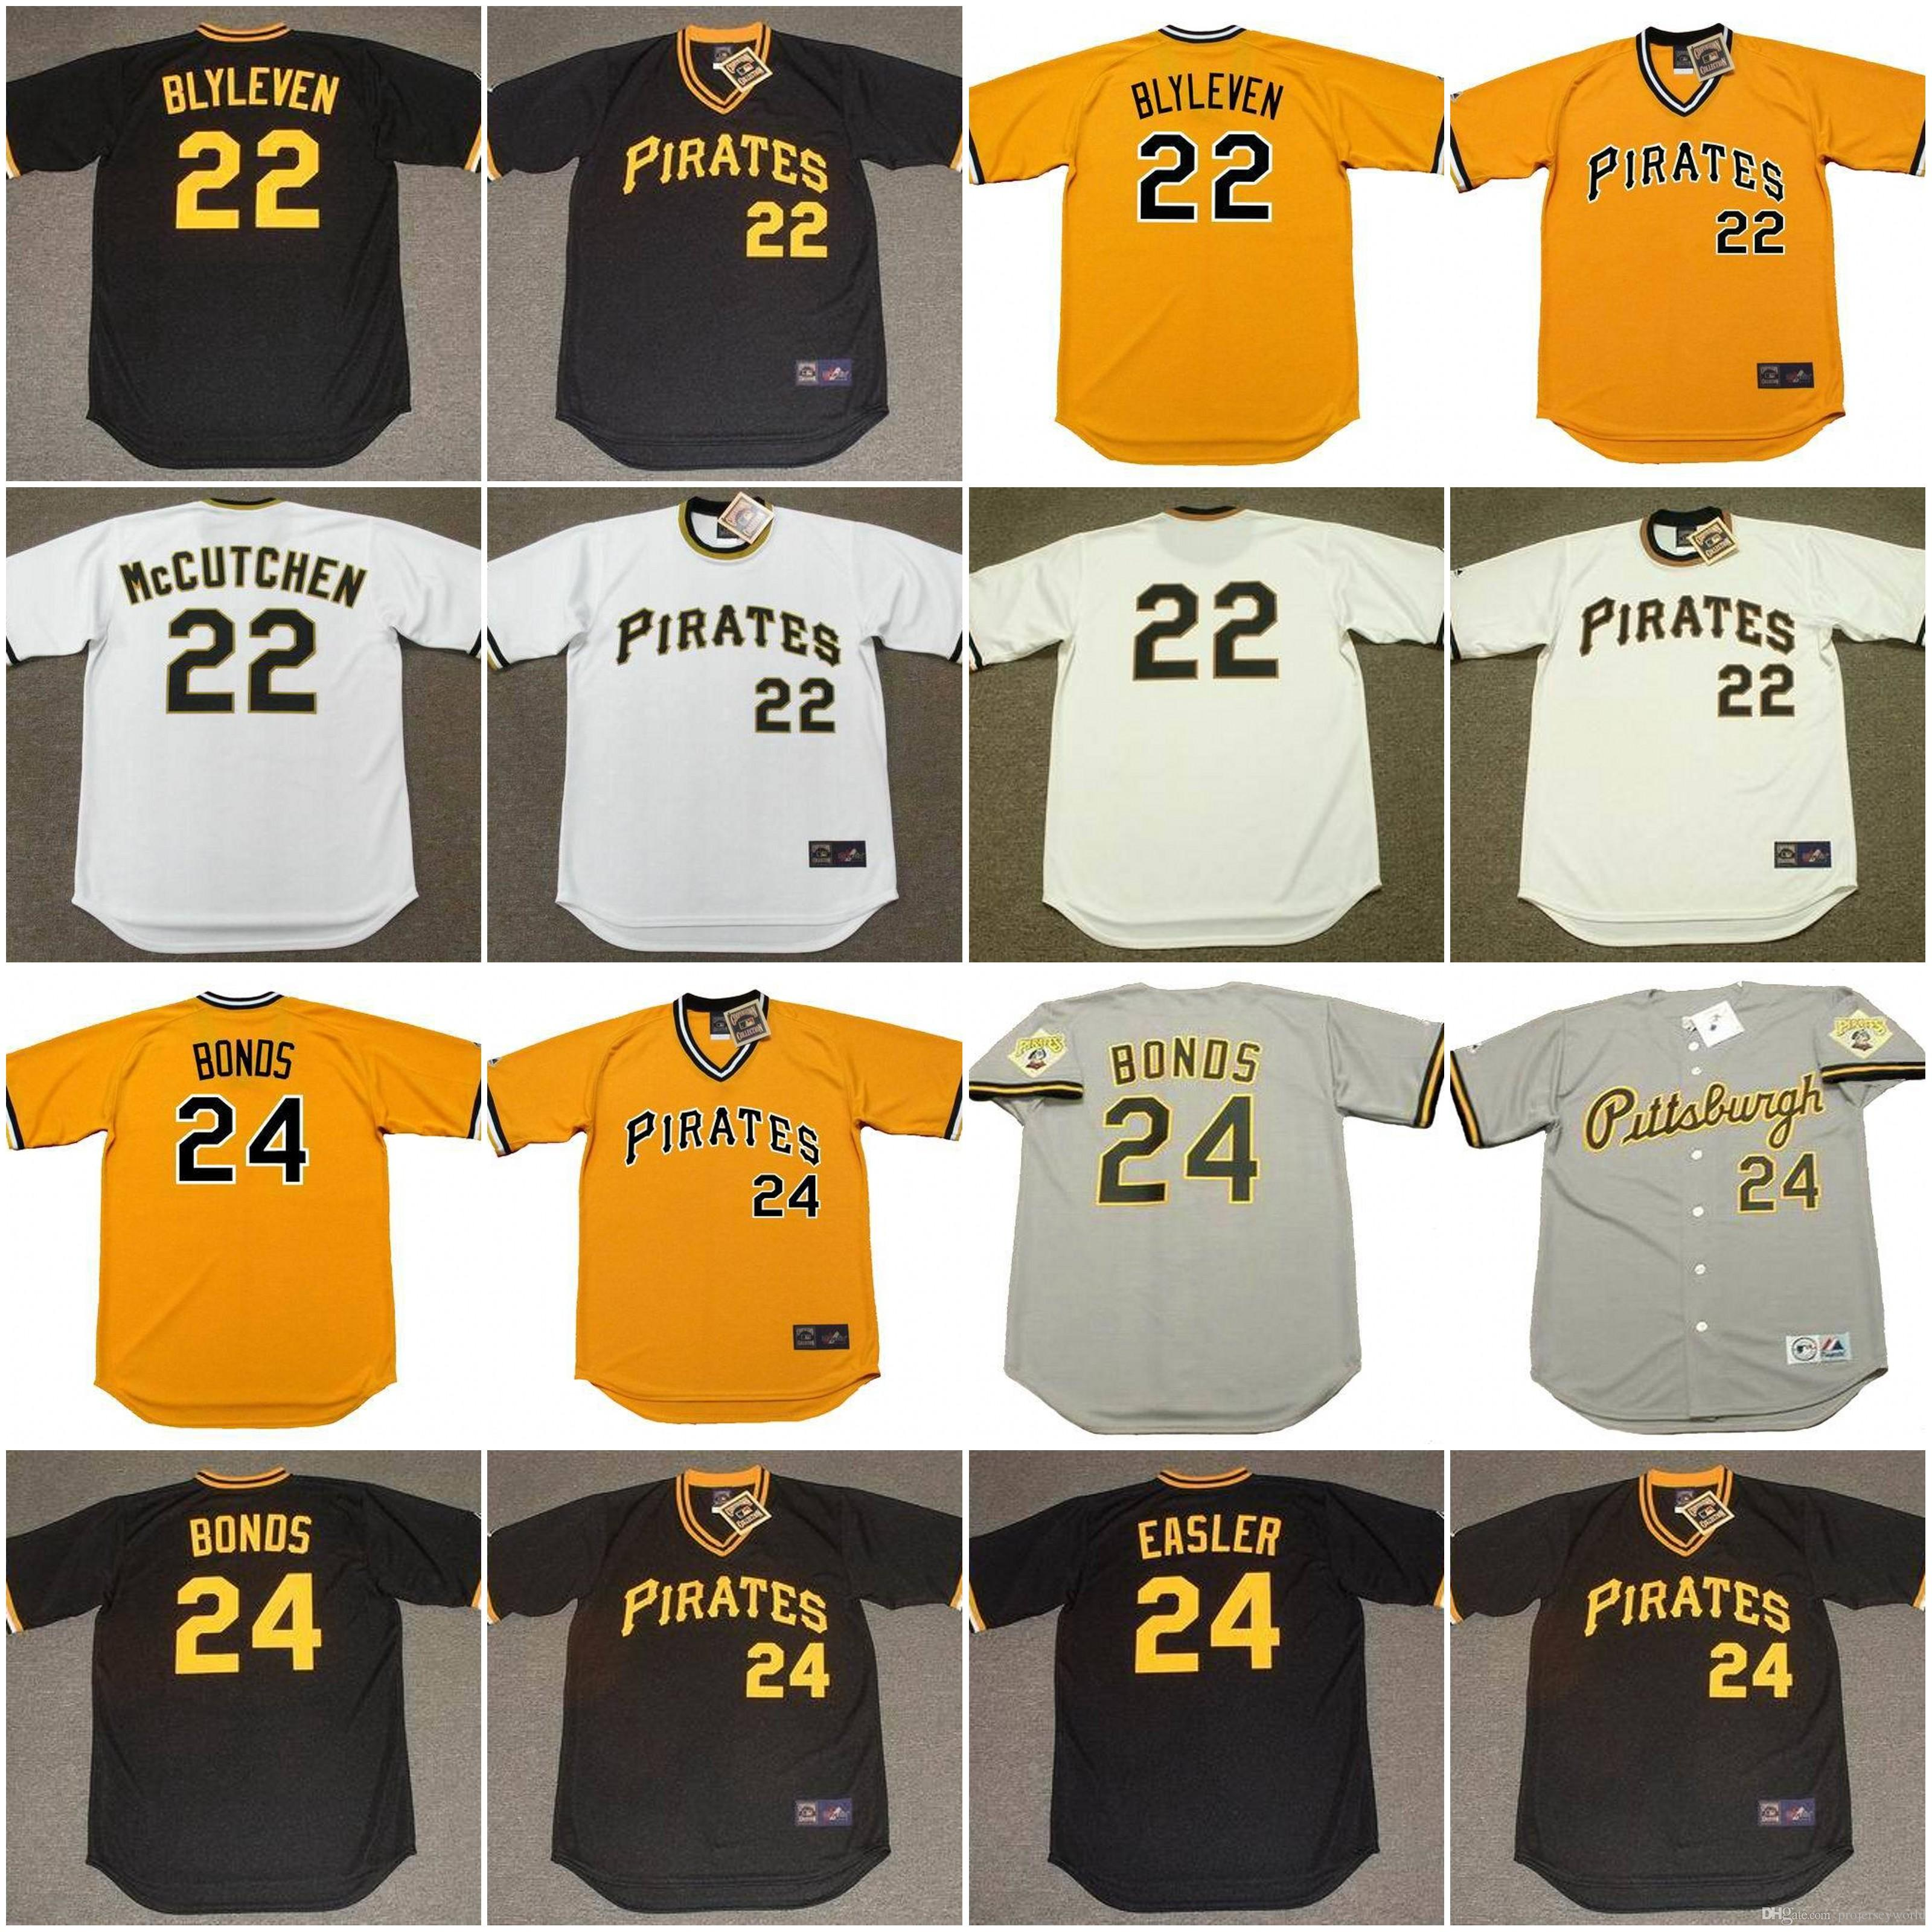 f88dbd5529d Mens Pittsburgh Pirates 22 ANDREW McCUTCHEN 1970s 22 BERT BLYLEVEN 24 BARRY  BONDS Mens Pittsburgh Pirates 24 Barry Bonds Grey Throwback Jersey .